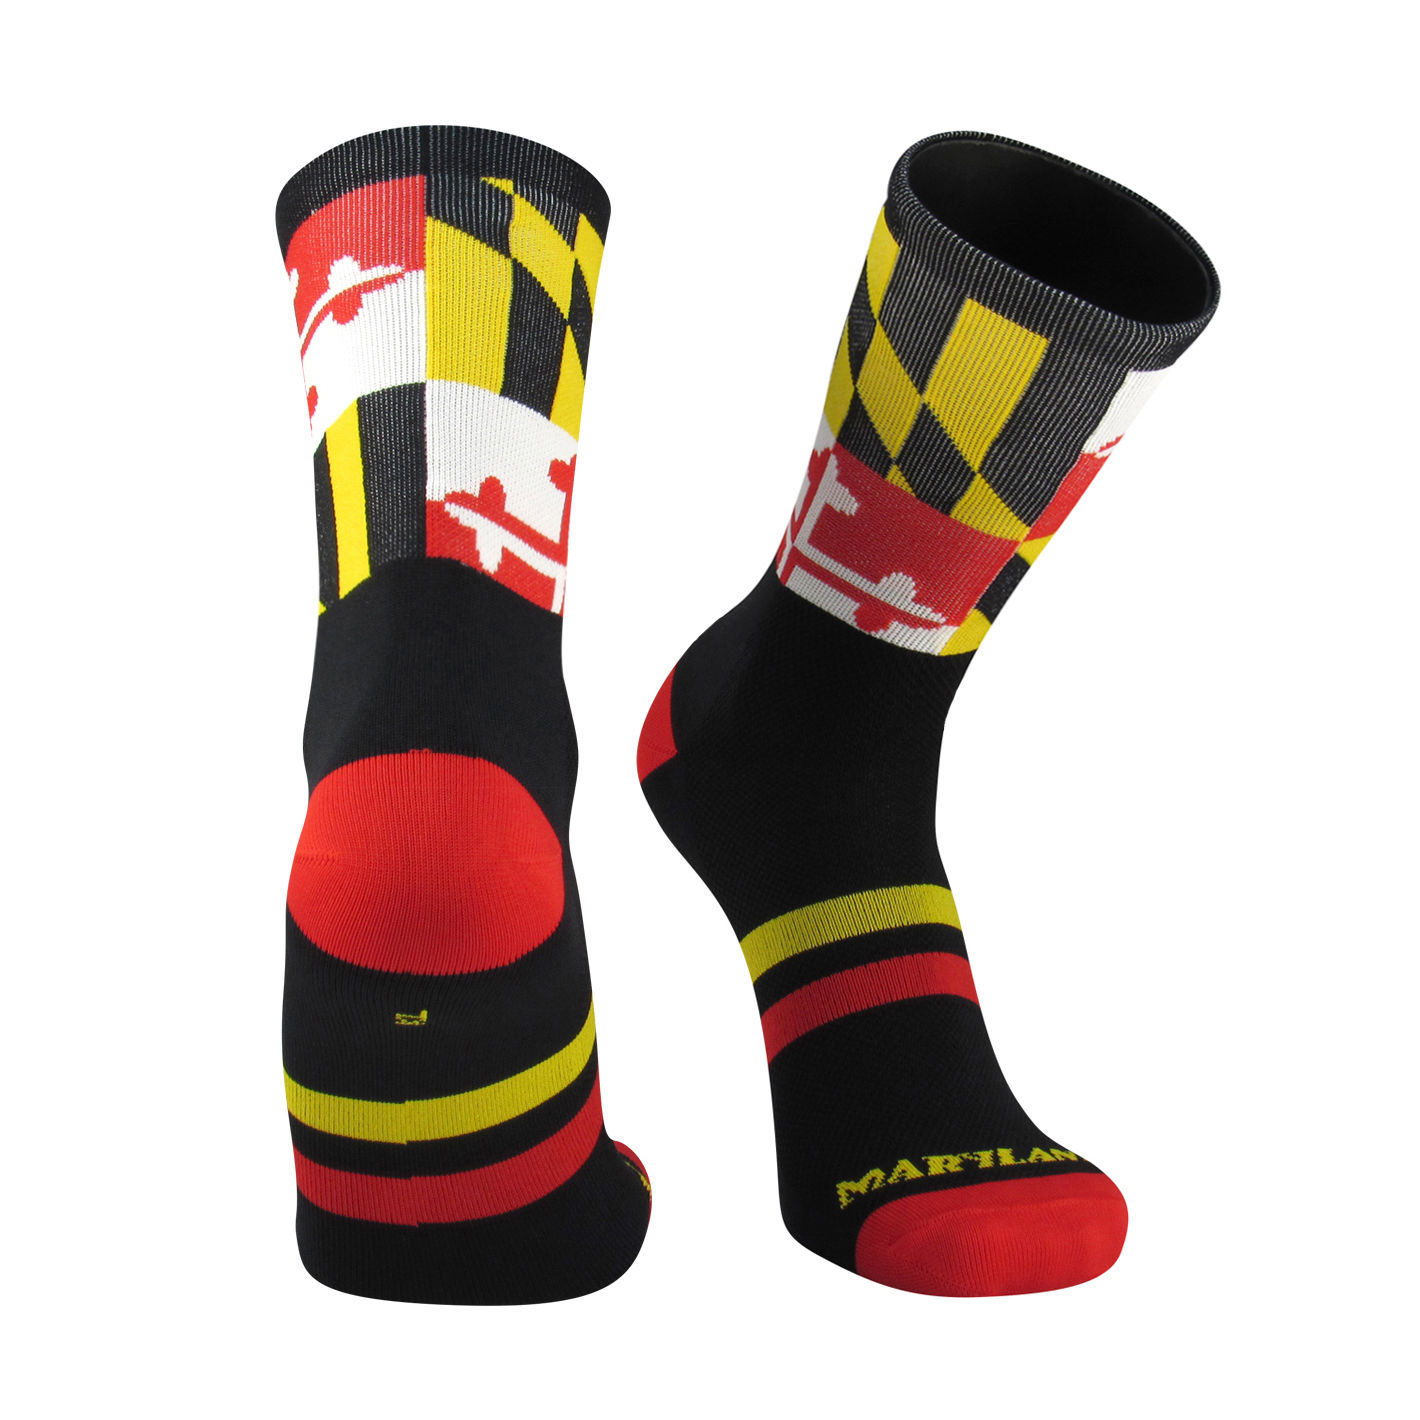 "TCK Elite Flag 6"" Crew Socks - MARYLAND 3.0 - Black/Gold/White/Scarlet - proDRI"